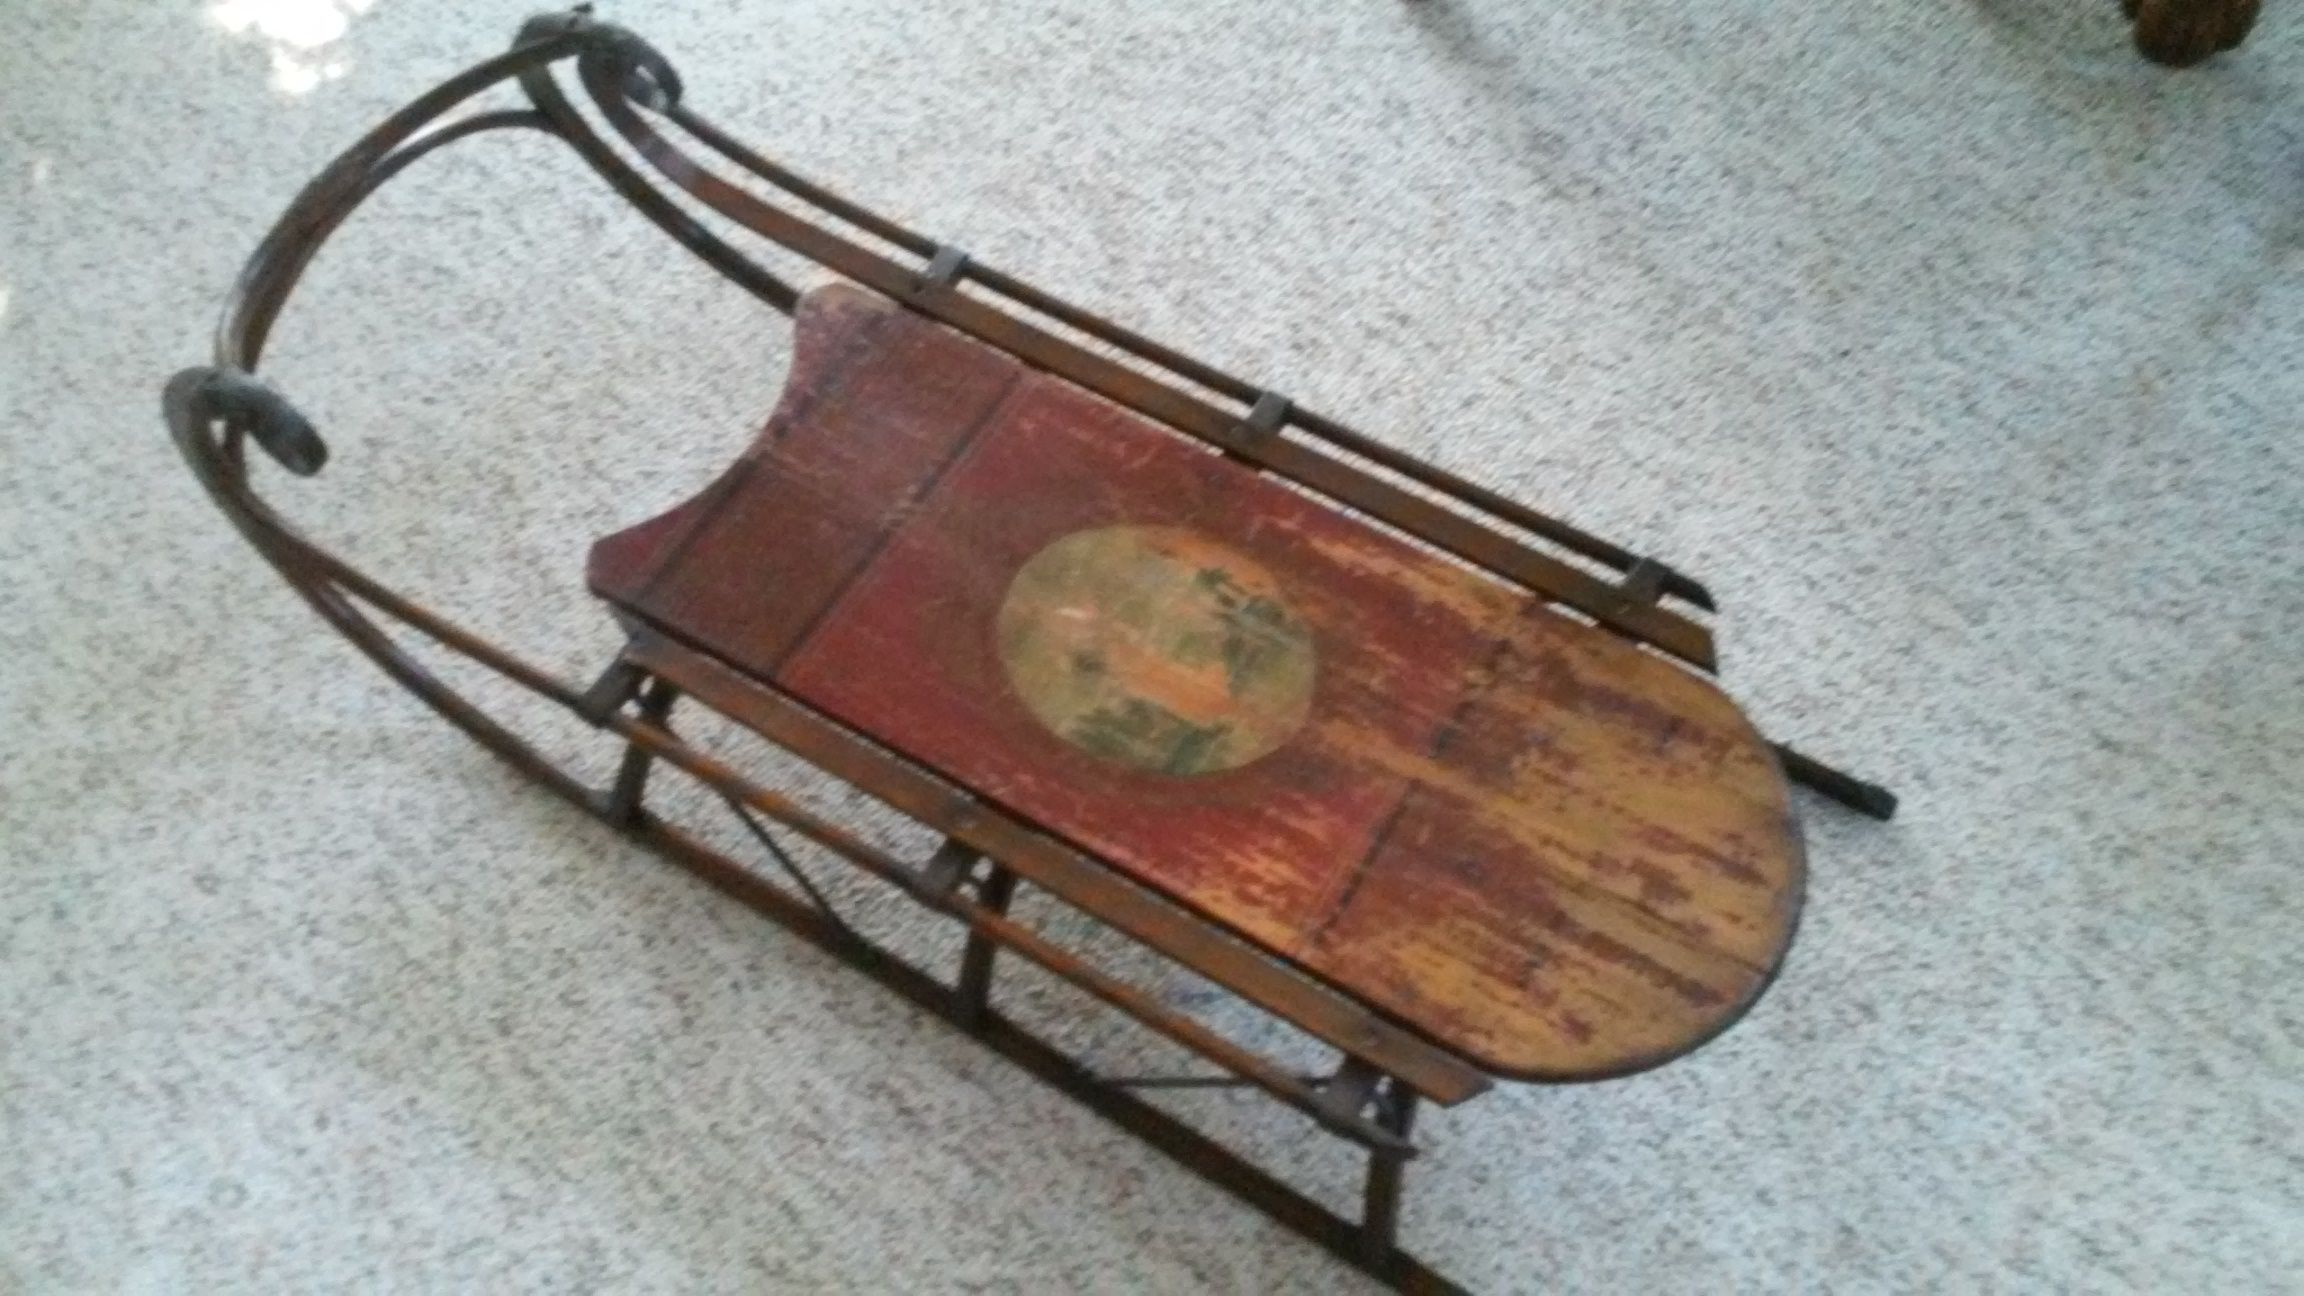 Antique Sleds Value Antique Childs Sled Antique Appraisal